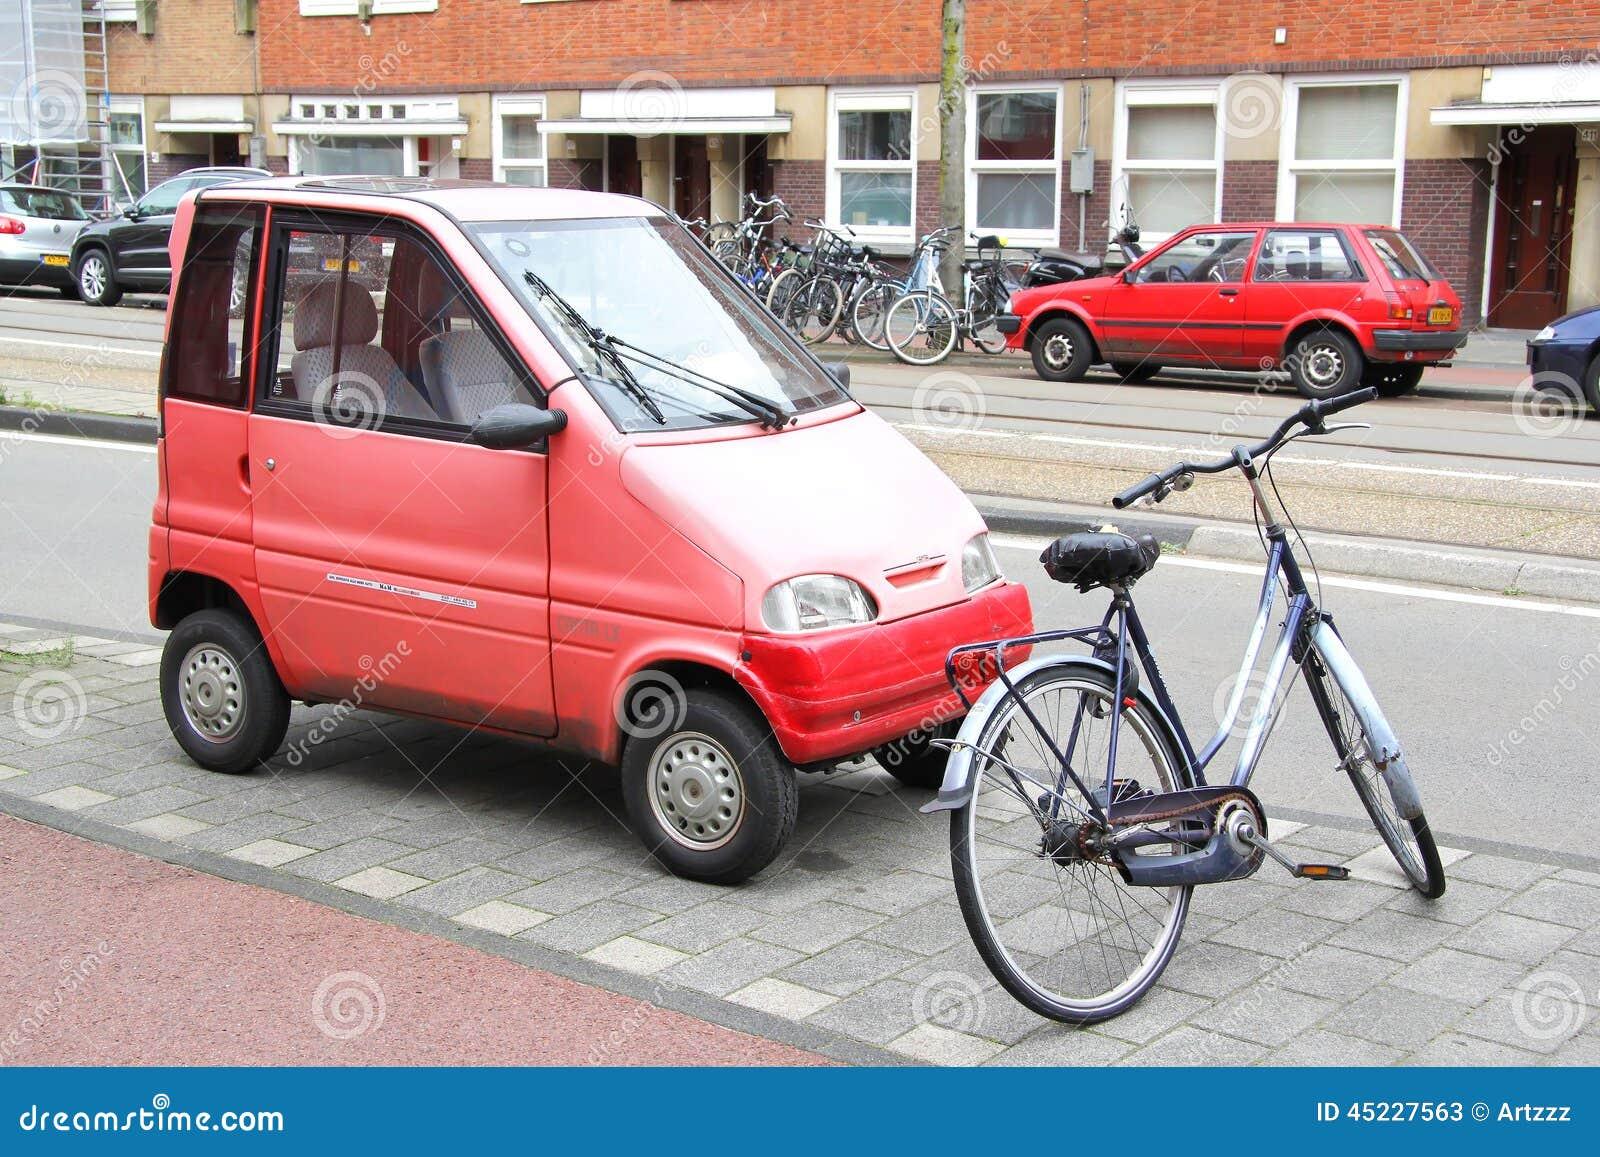 Canta Lx Editorial Stock Photo Image Of Aged Auto Invalid